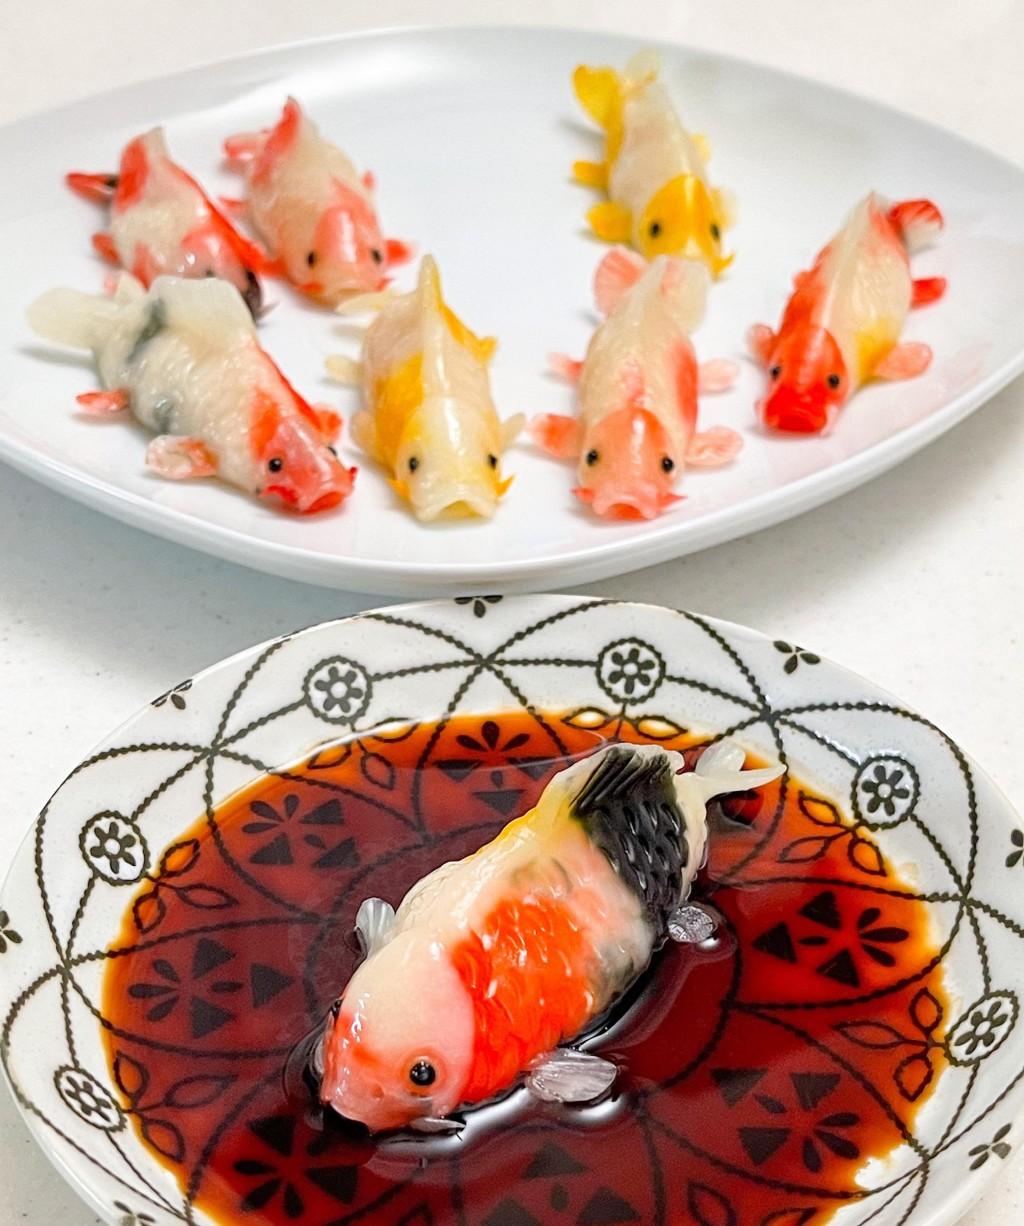 Fish dumplings from Taiwan make a splash